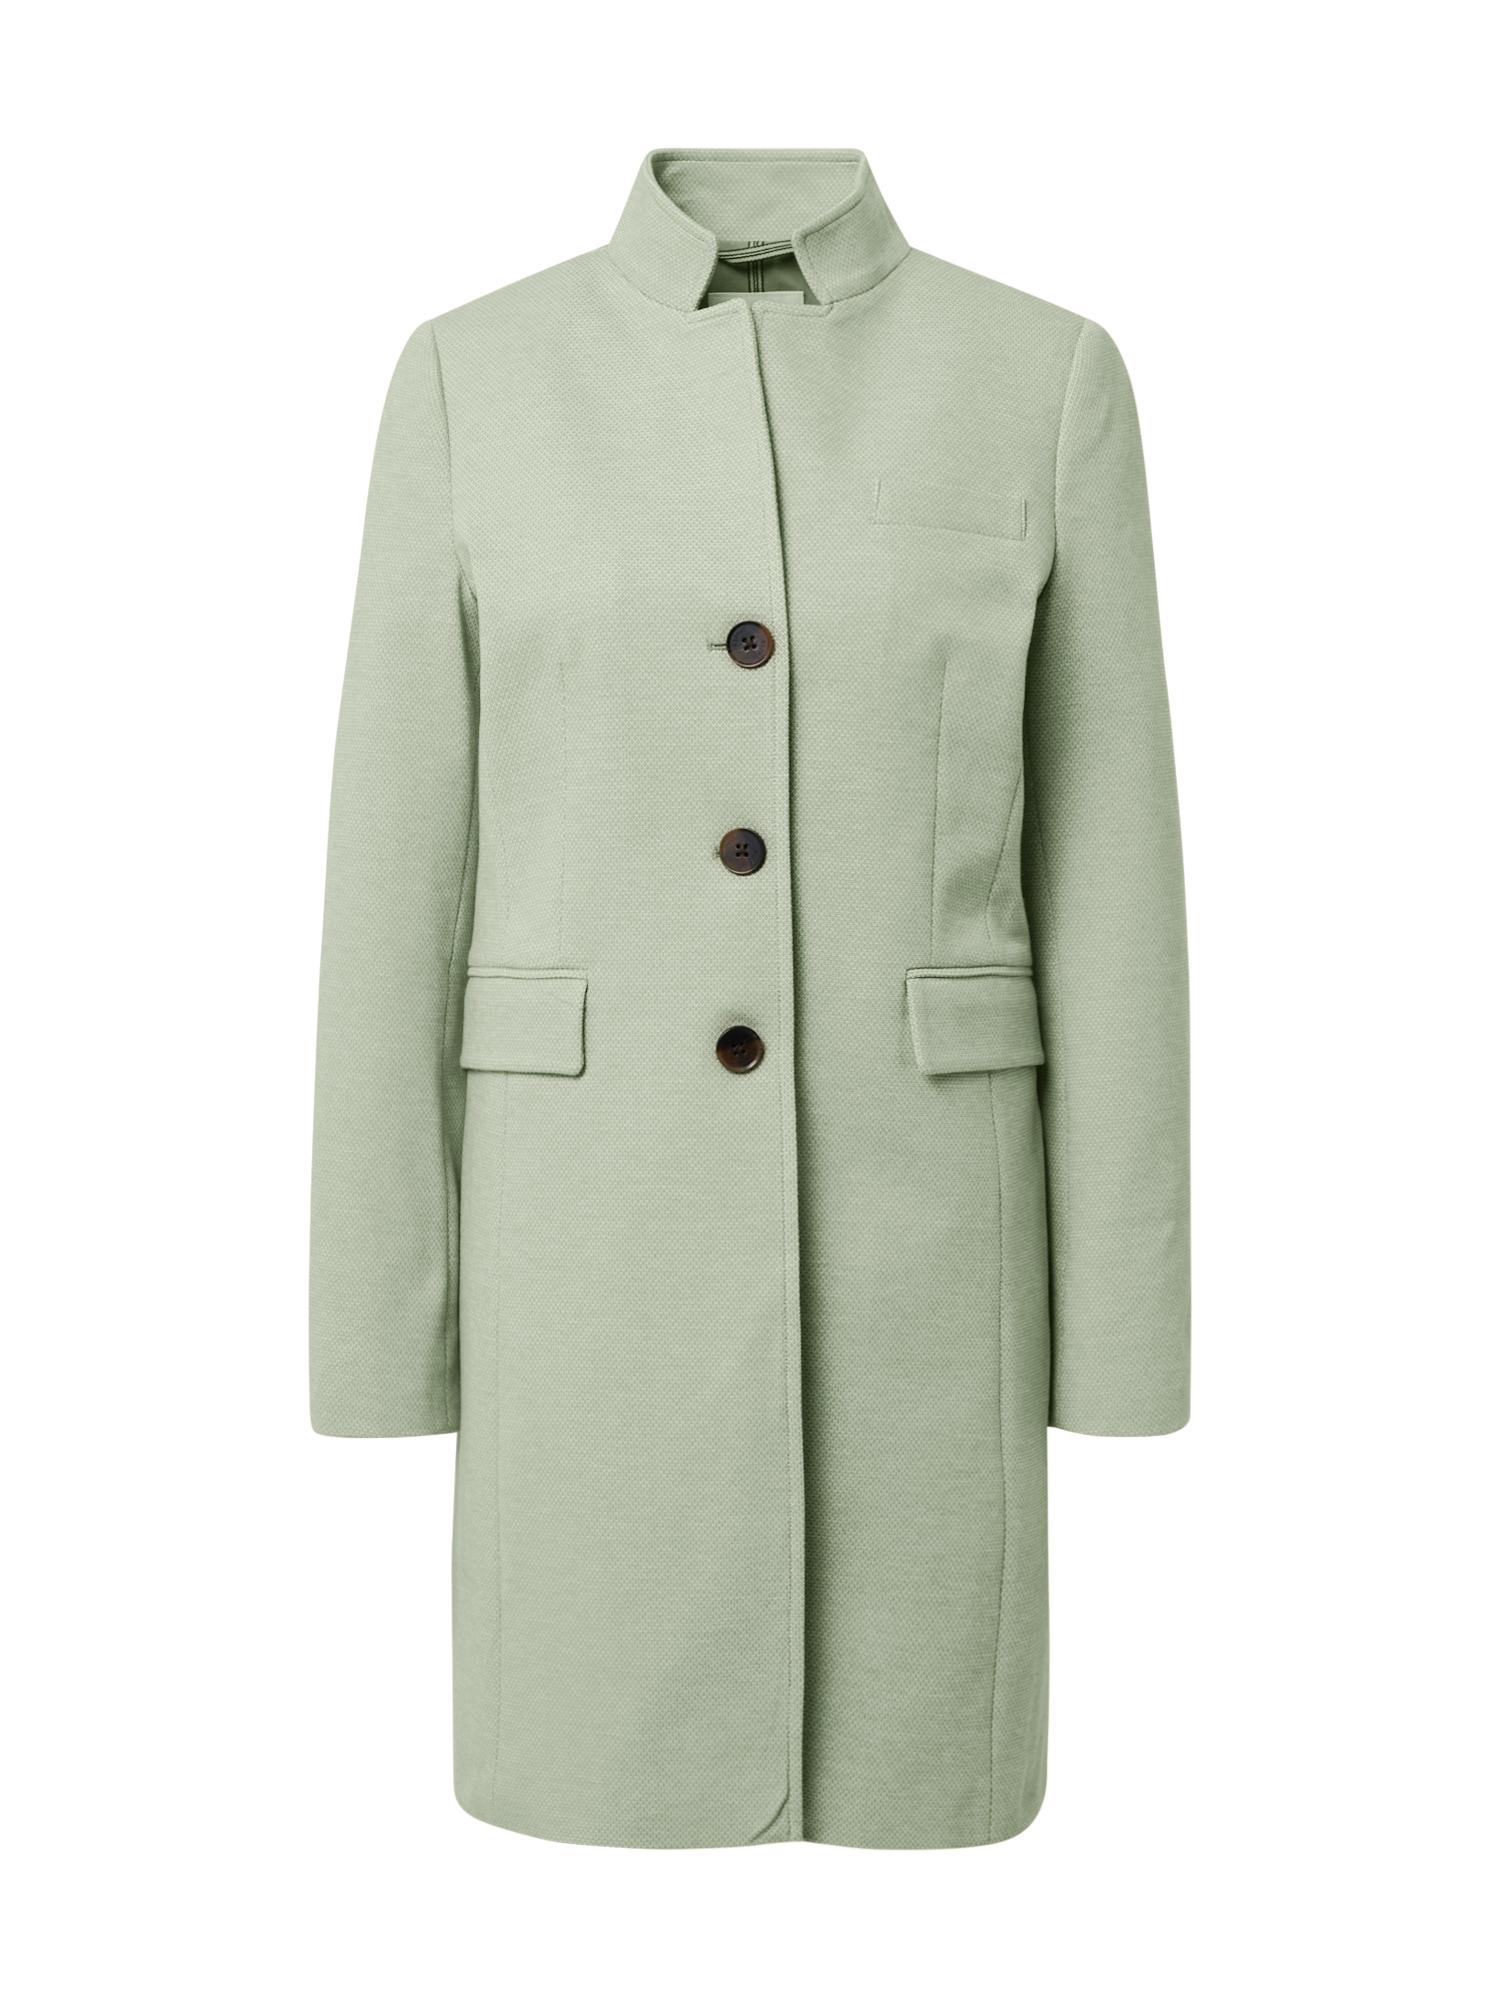 ESPRIT Demisezoninis paltas mėtų spalva